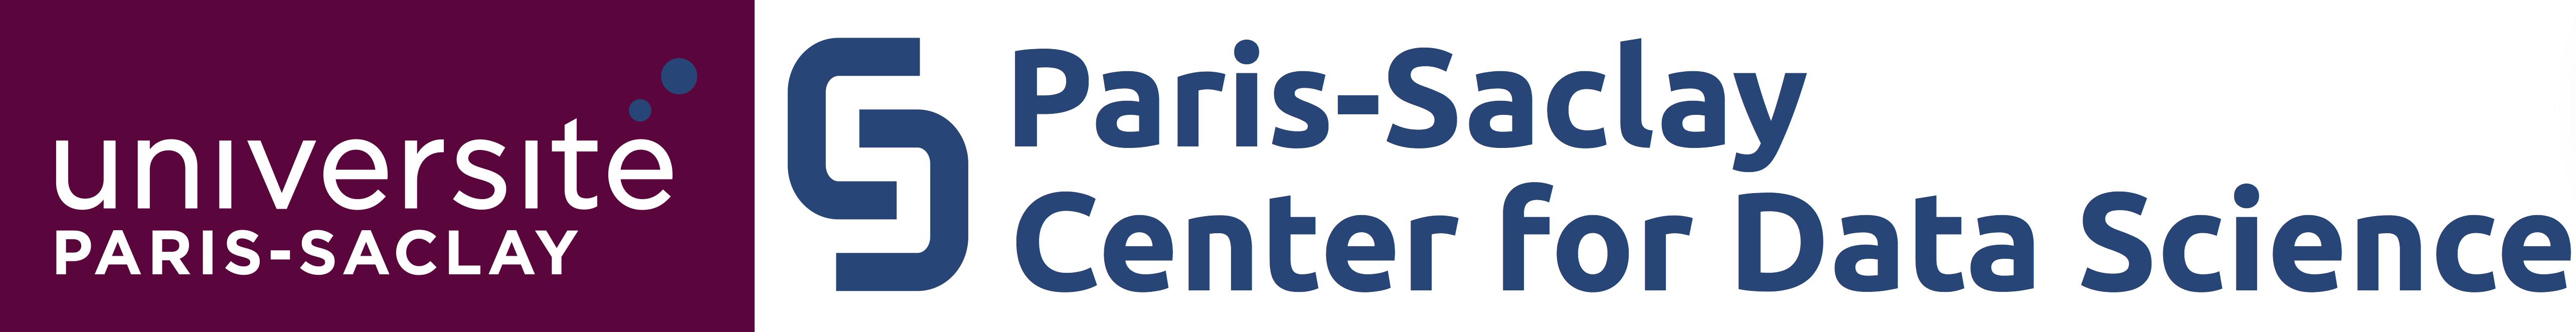 Python workshop - Paris-Saclay Center for Data Science